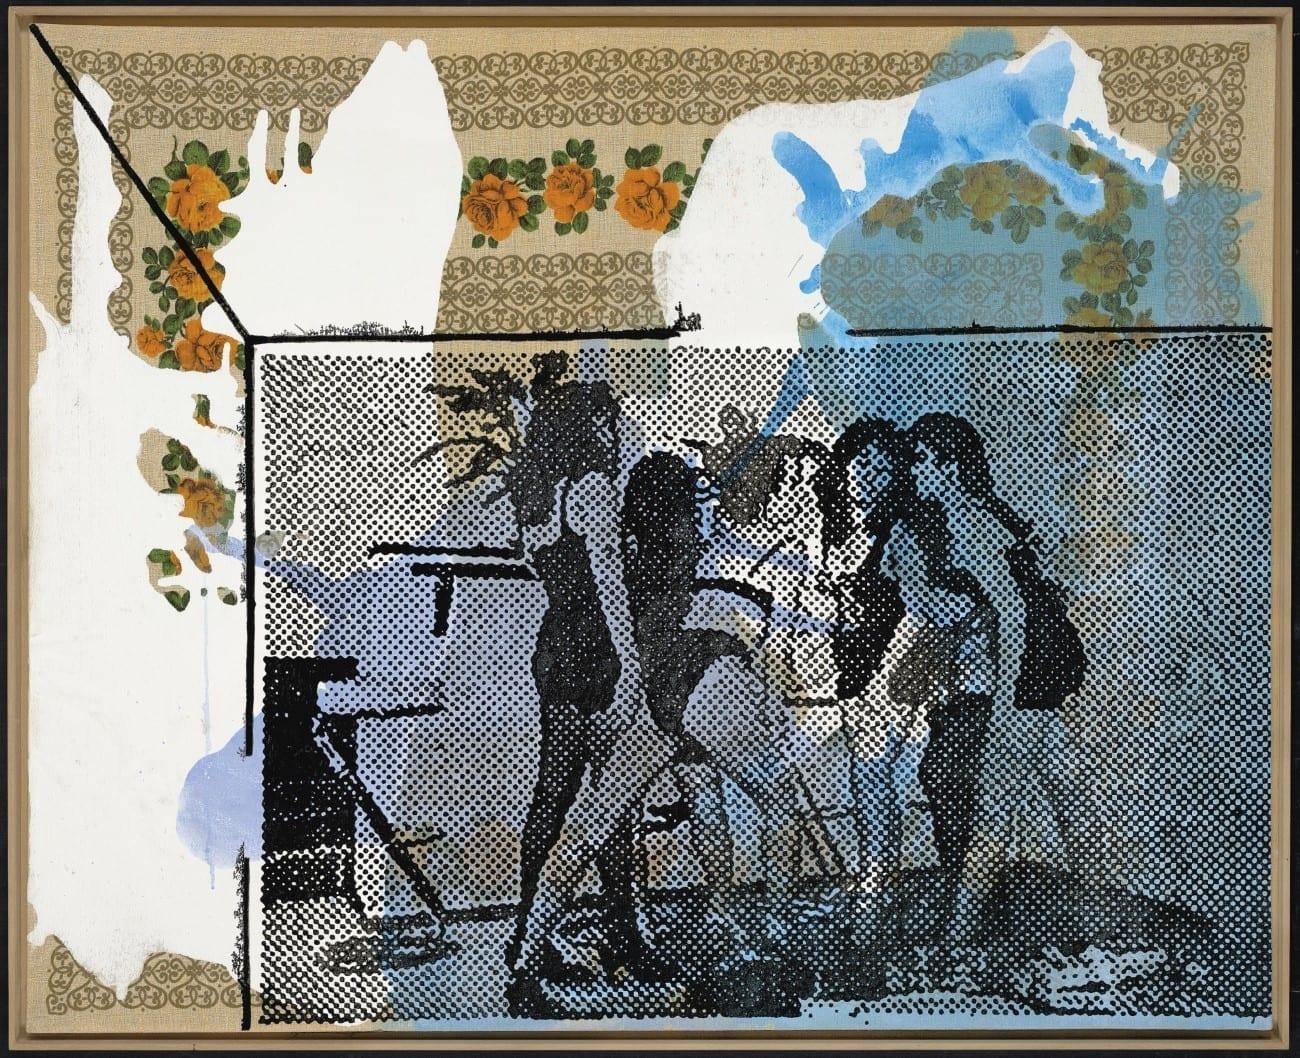 Sigmar-Polke-Frauen-1999-Bikini (Custom)